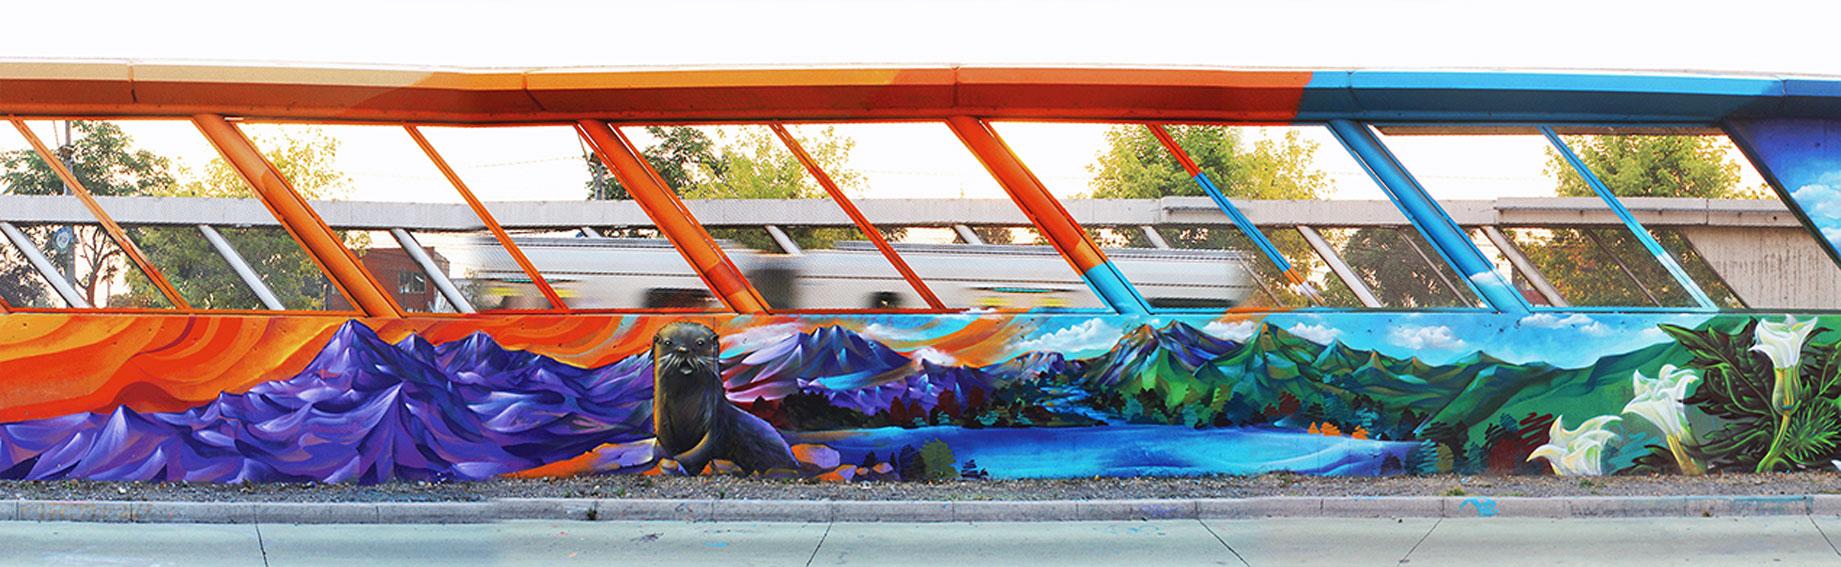 Mural La Creacion